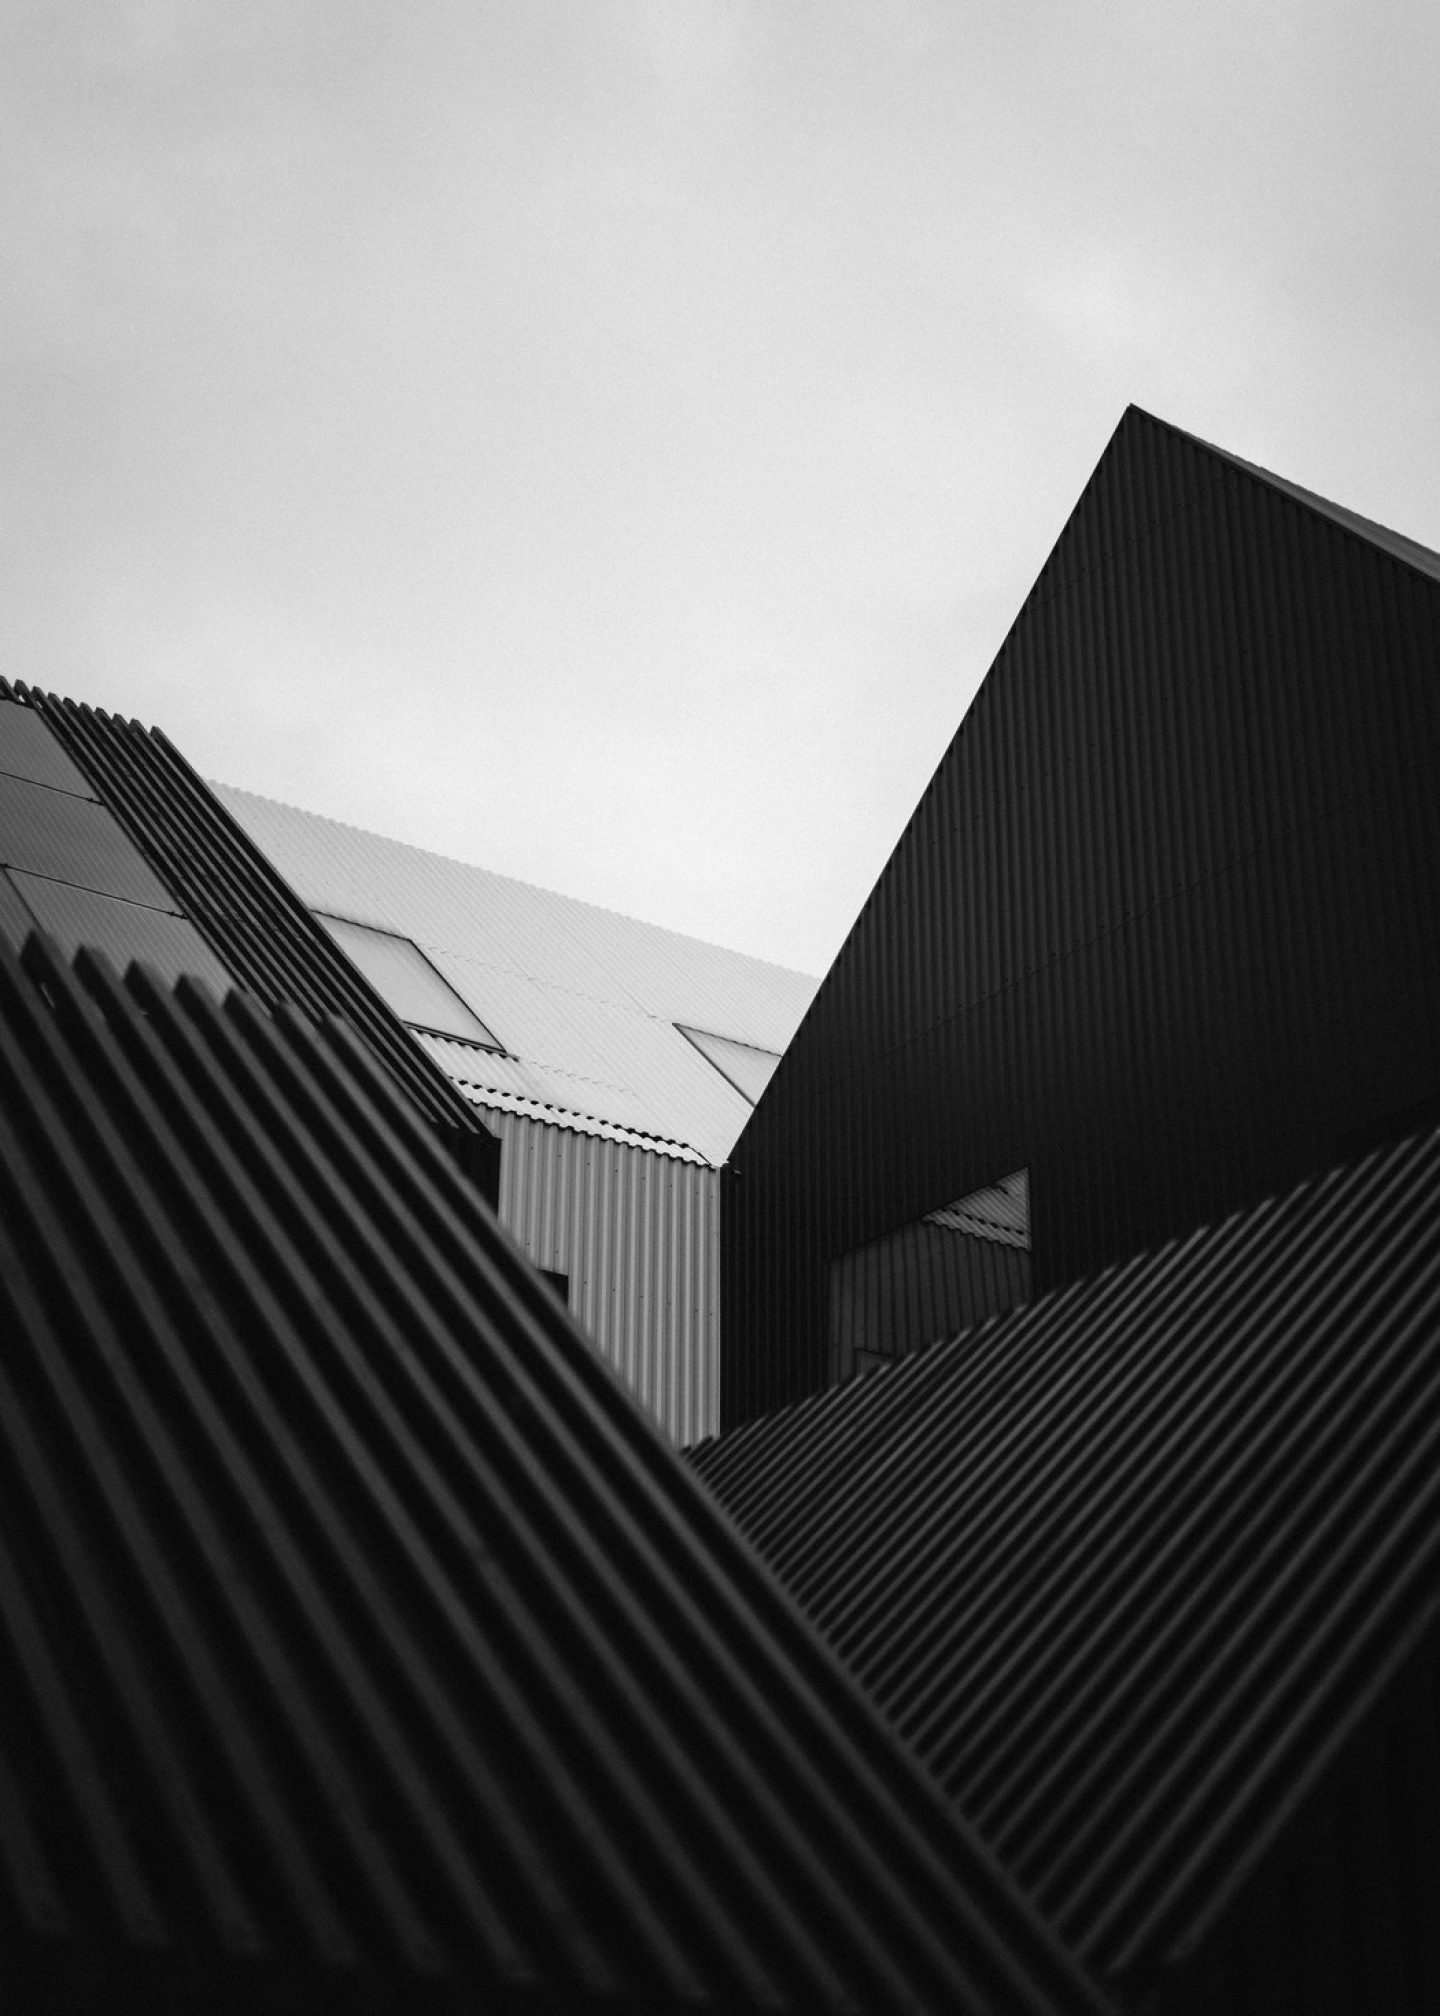 kim_holtermand_architecture-5-kopiowanie